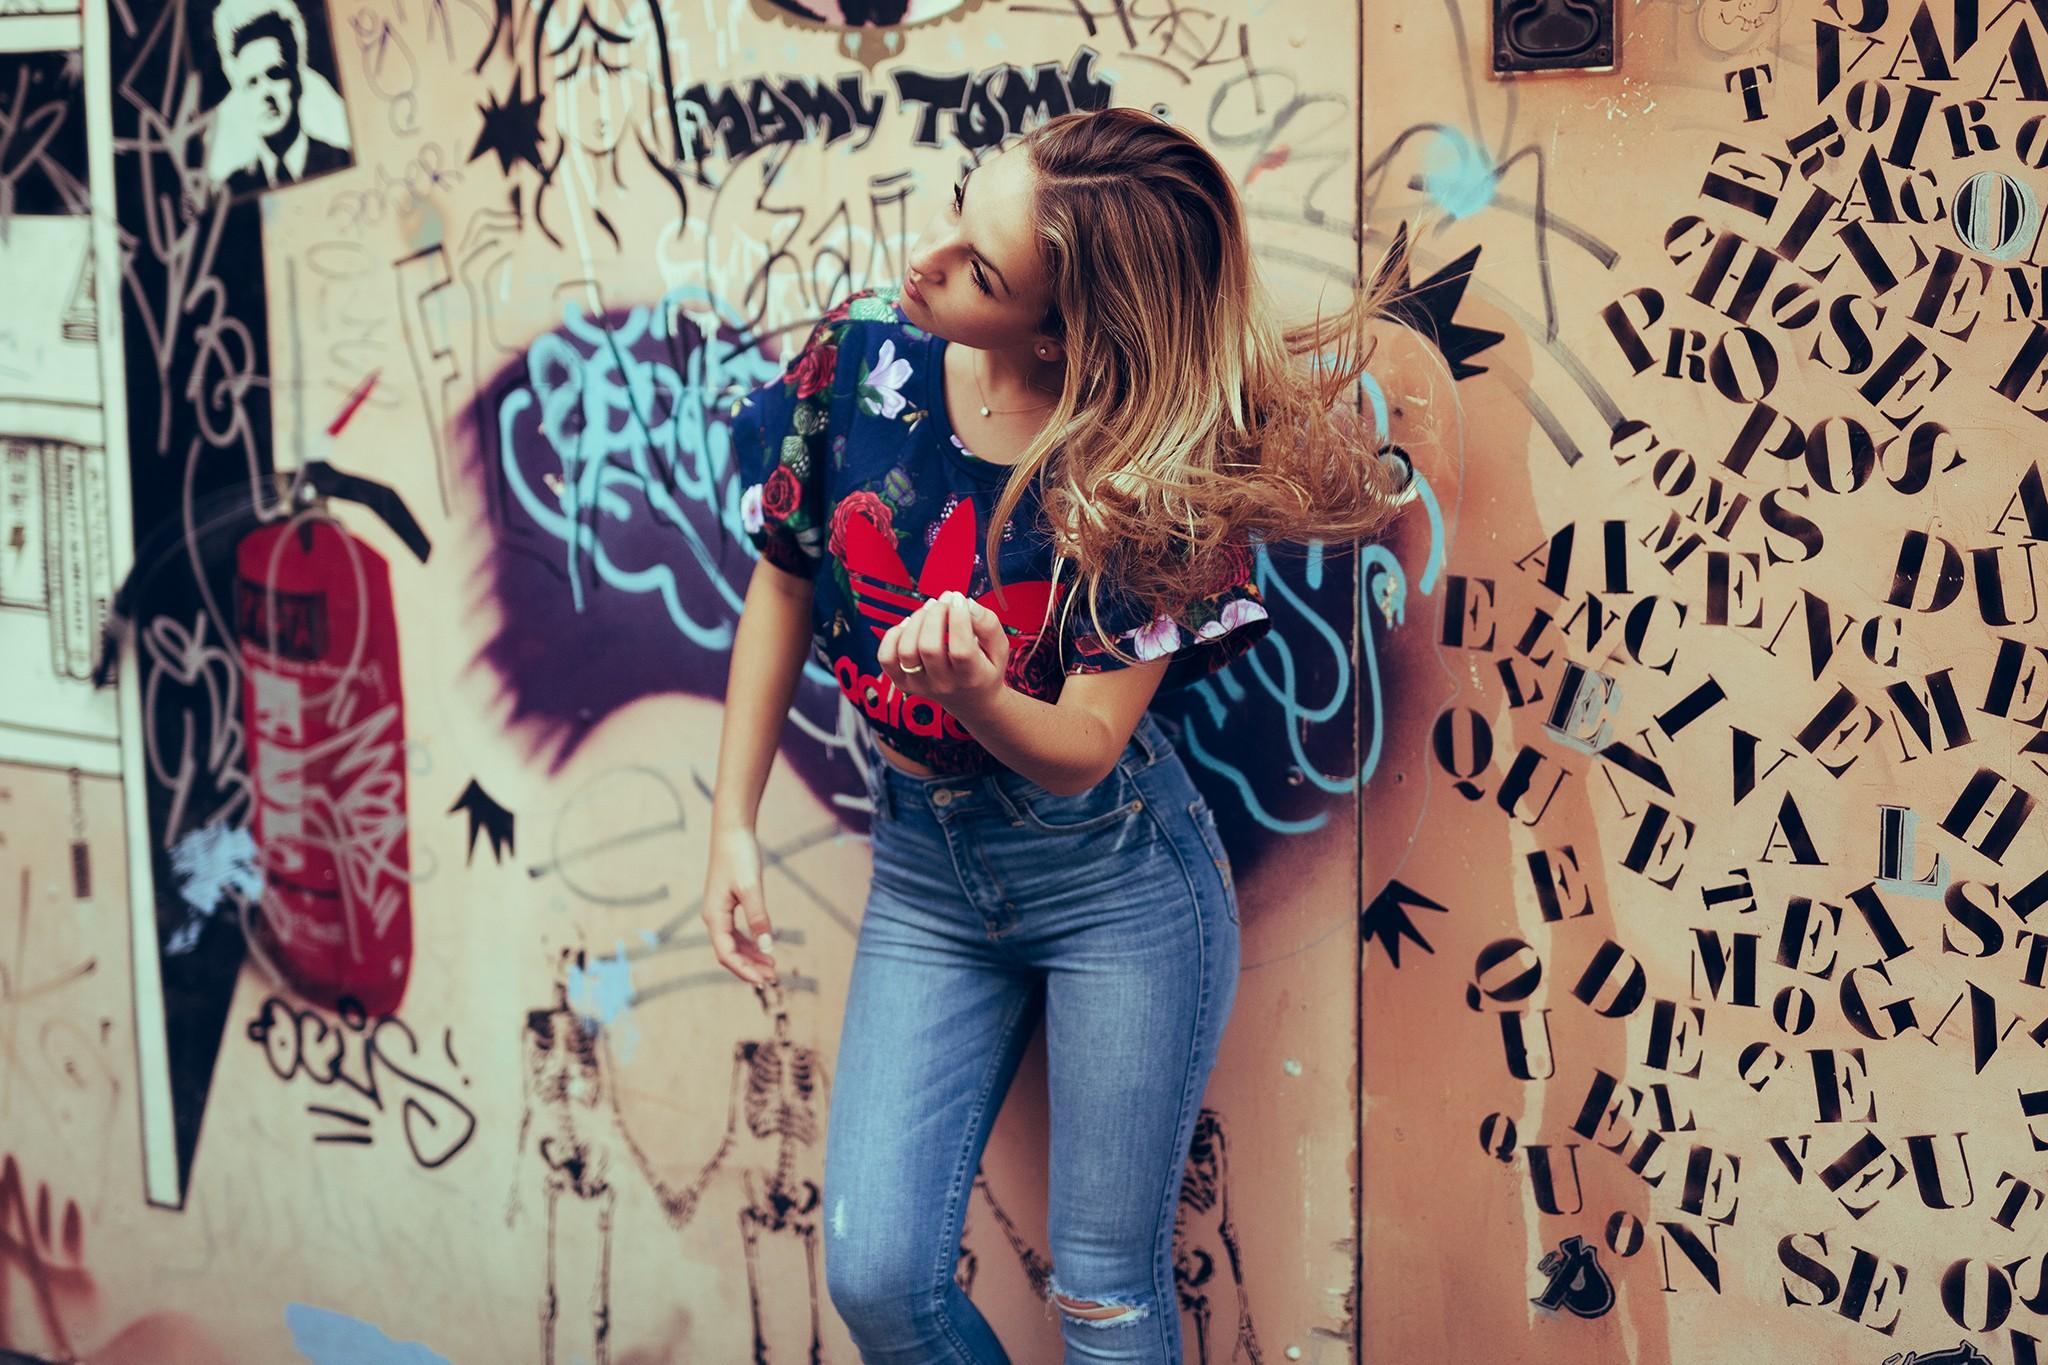 Frau Modell  Jeans Mode KUNST Farbe Wände 2048x1365 Px Fotoshooting  Interaktion